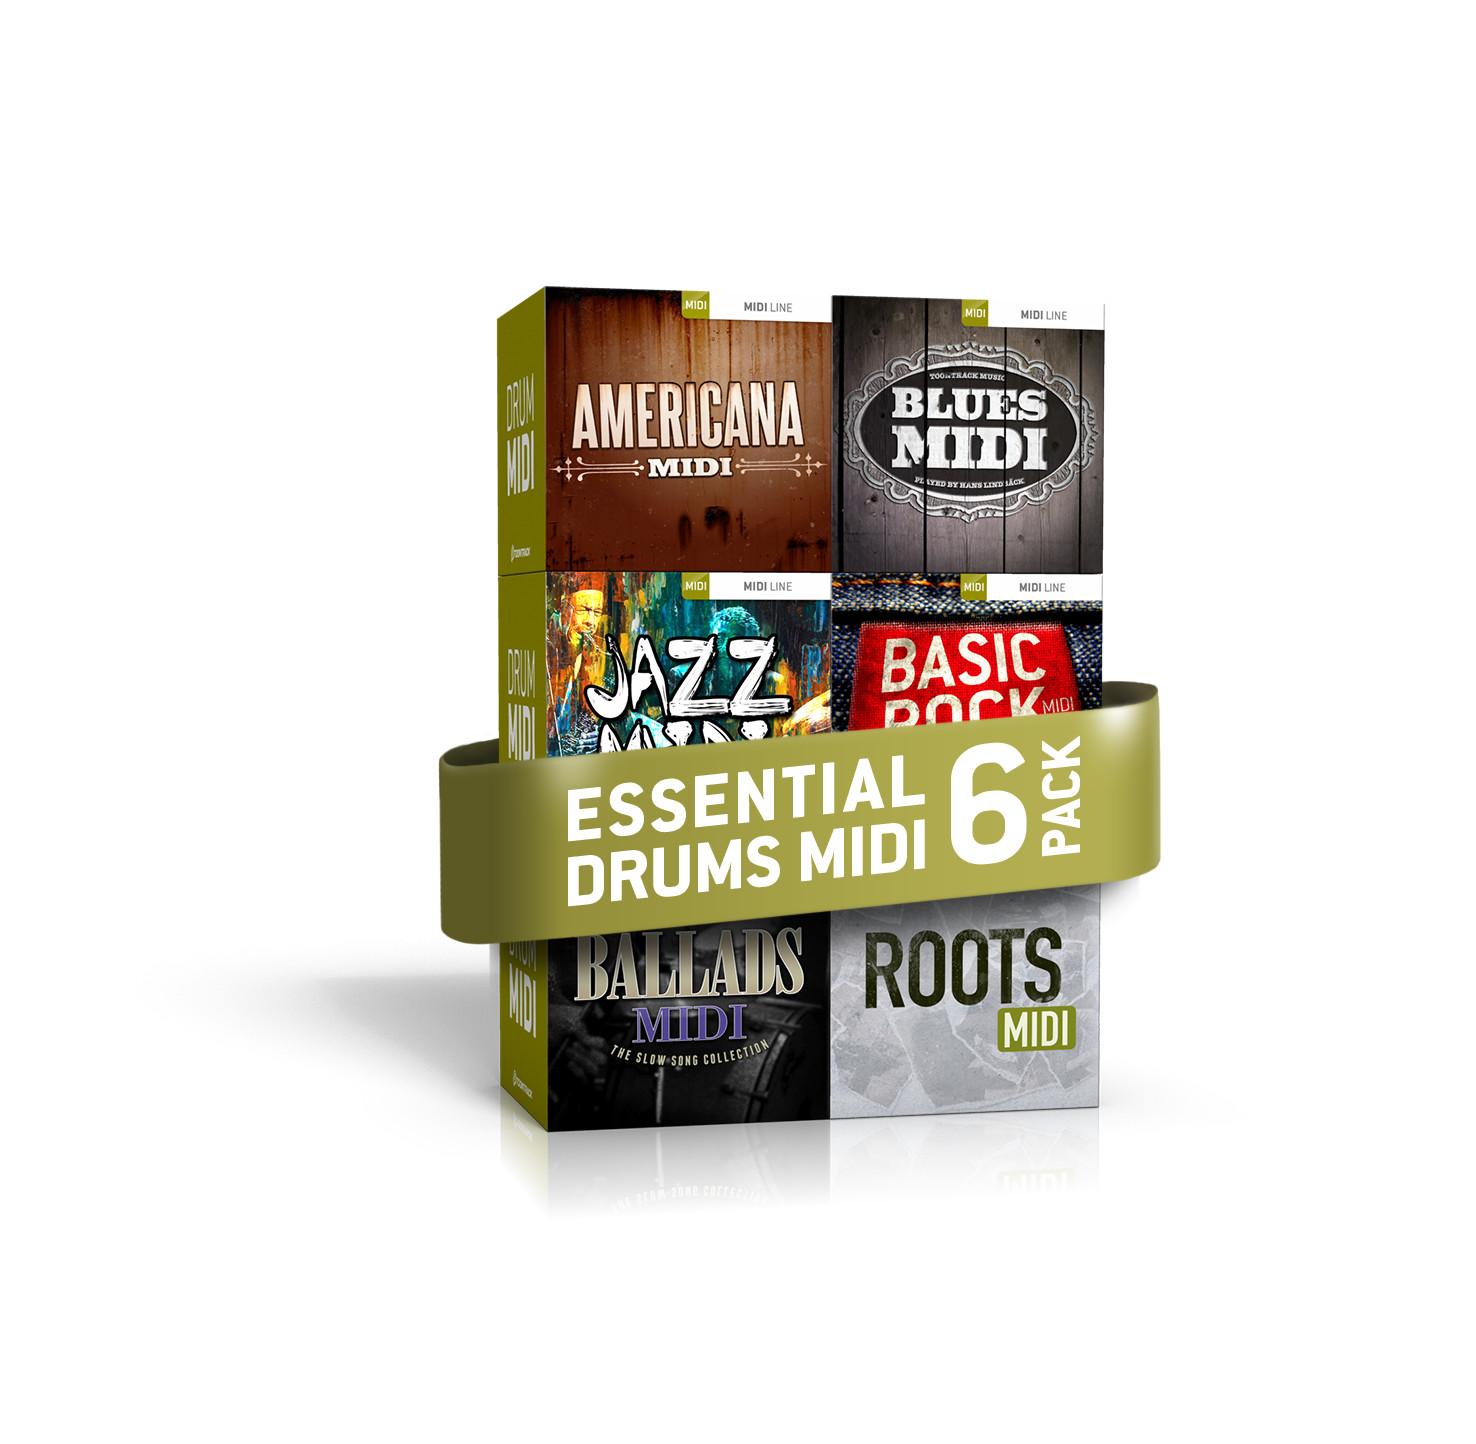 toontrack essential drums midi 6 pack bundle of drums midi libraries. Black Bedroom Furniture Sets. Home Design Ideas